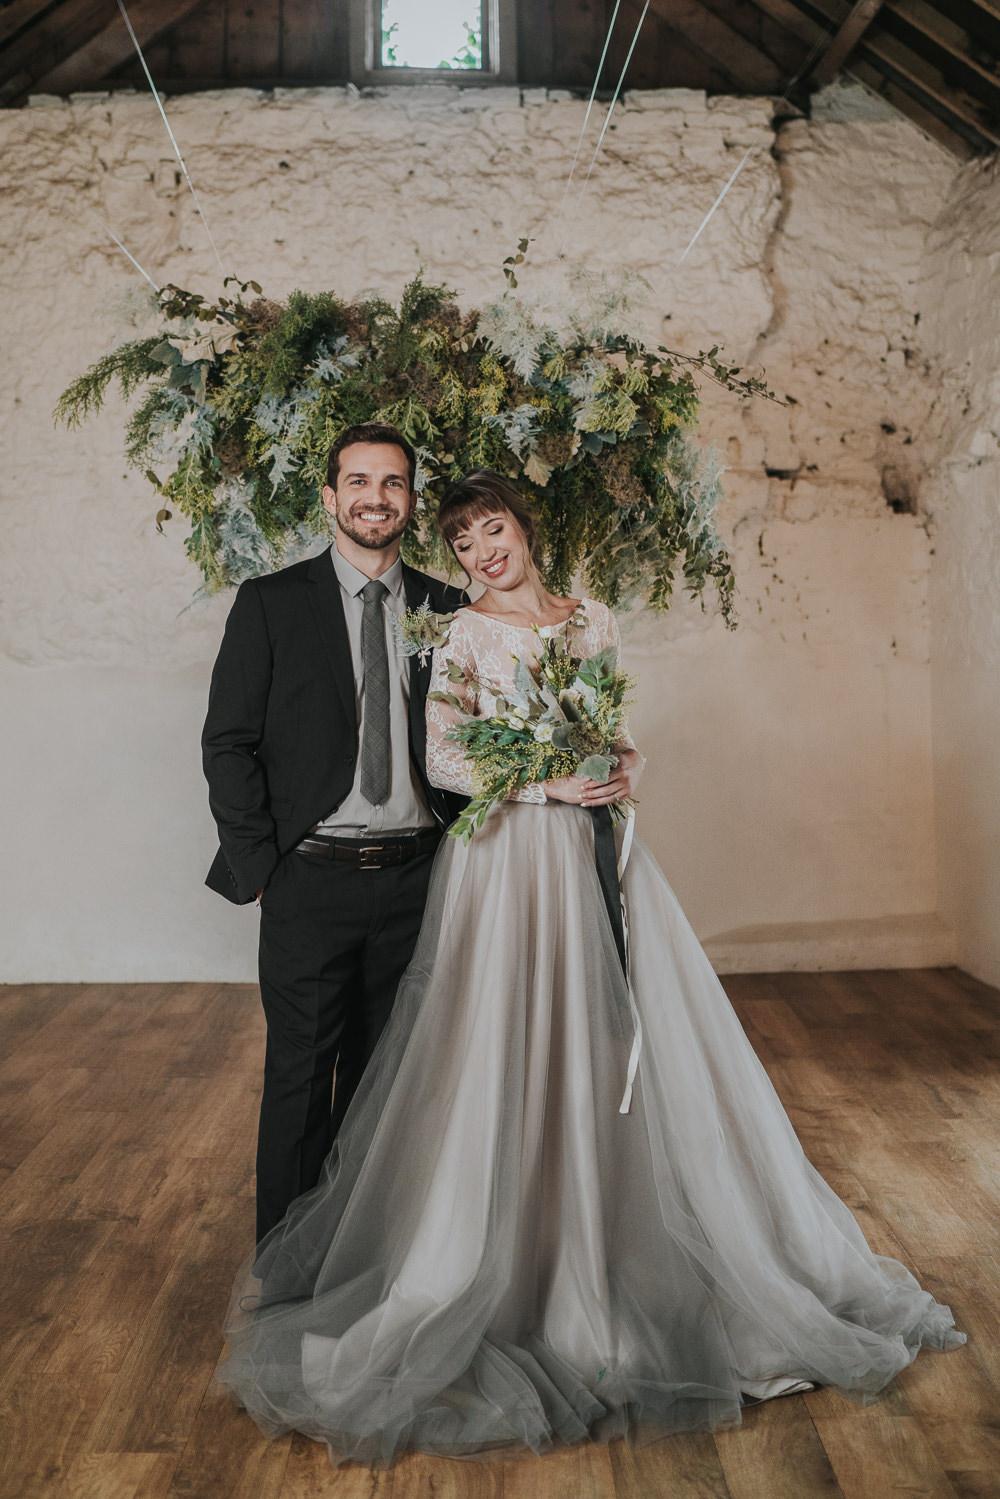 Grey Wedding Ideas Grace Elizabeth Suspended Flowers Installation Hanging Cloud Greenery Foliage